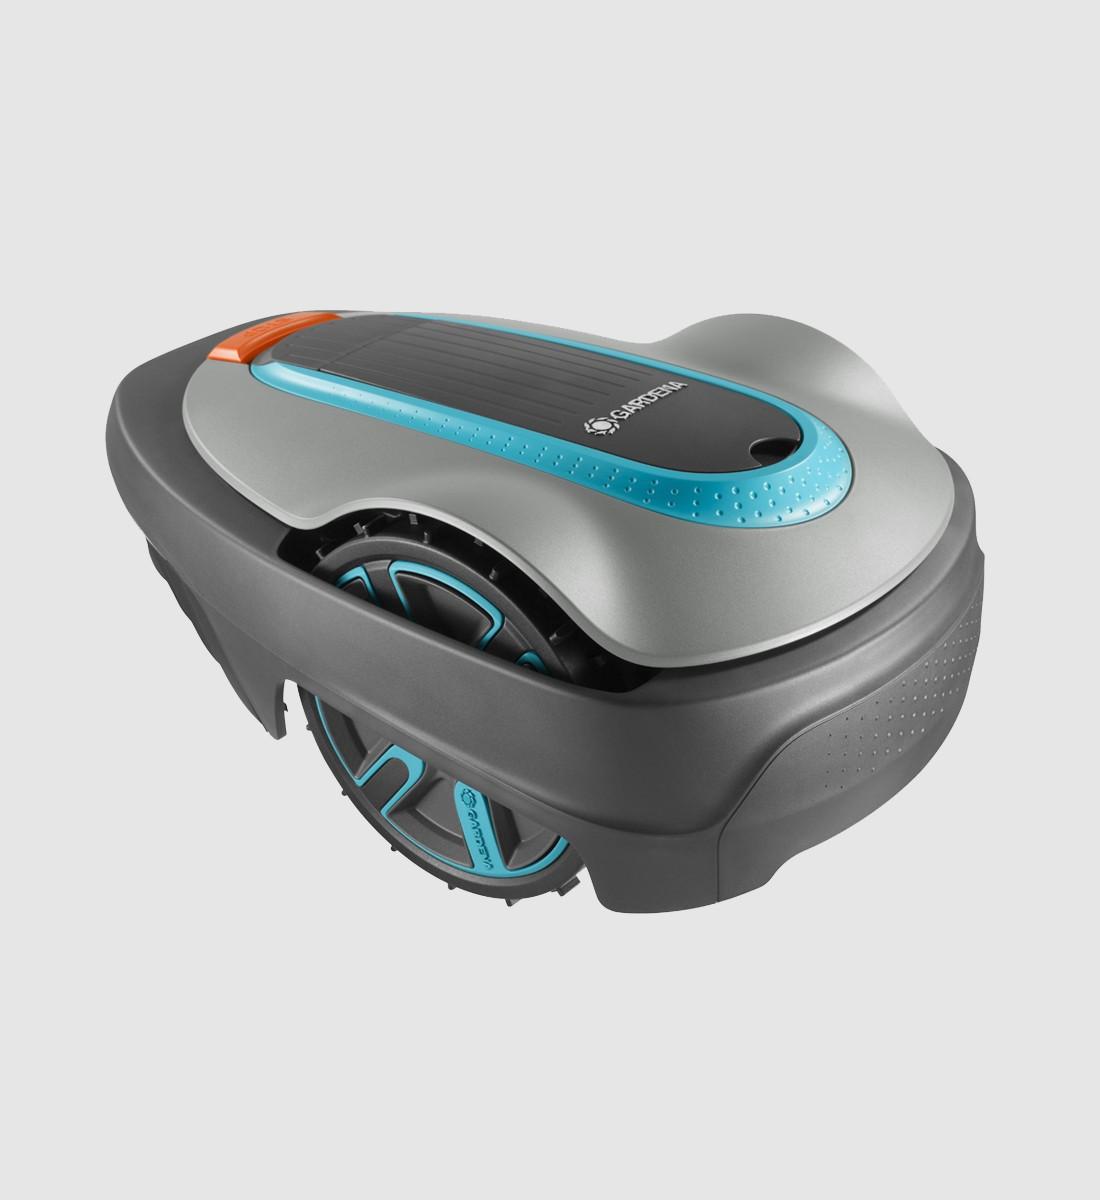 Robotklippare Sileno city 250